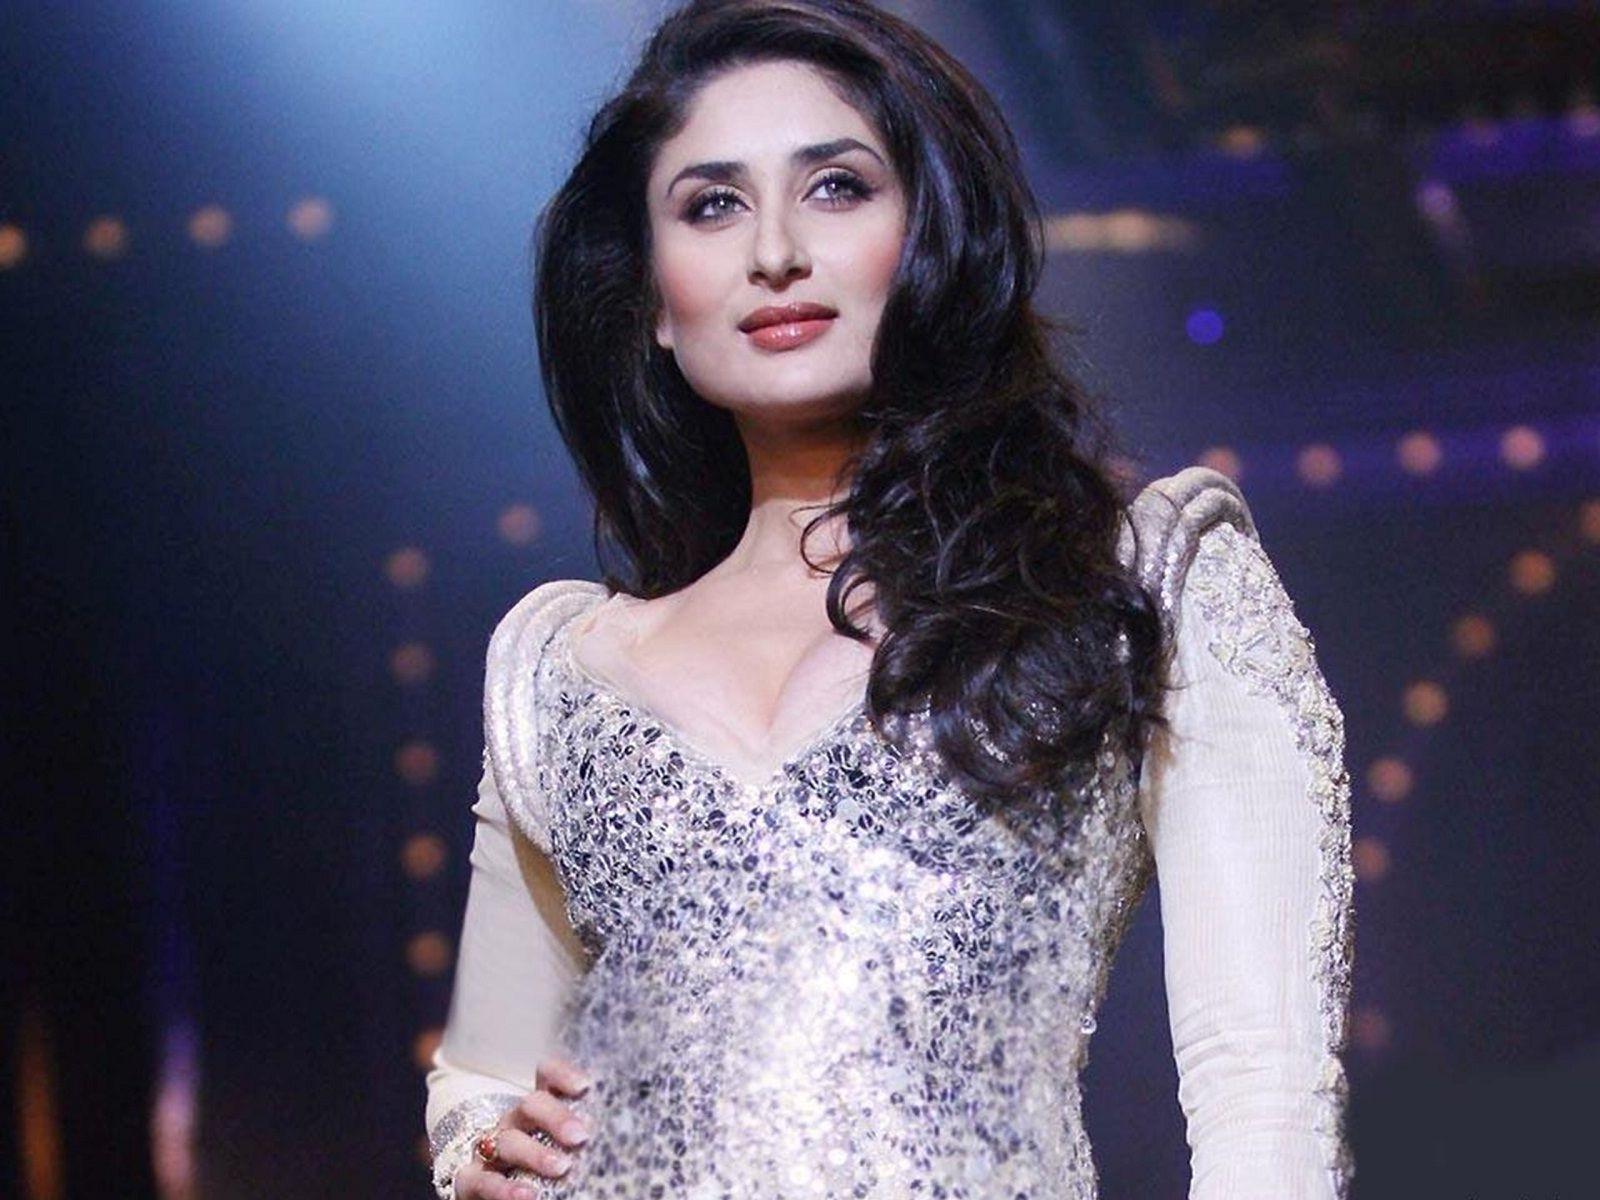 kareena kapoor wallpaper in heroine movie | kareena kapoor khan